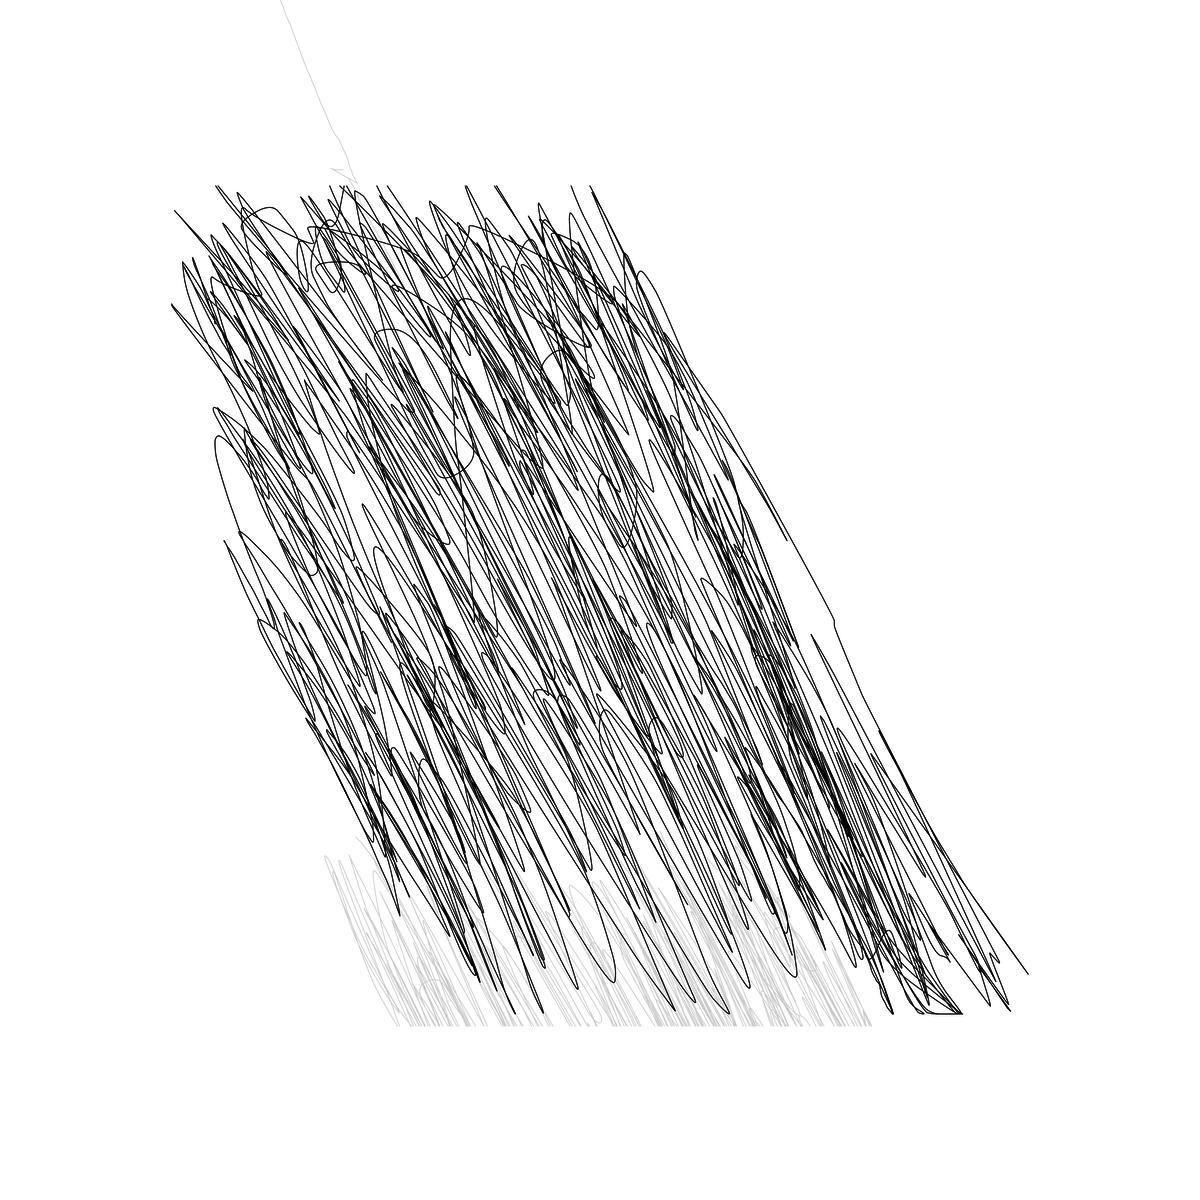 BAAAM drawing#8823 lat:52.4883499145507800lng: 13.4250297546386720